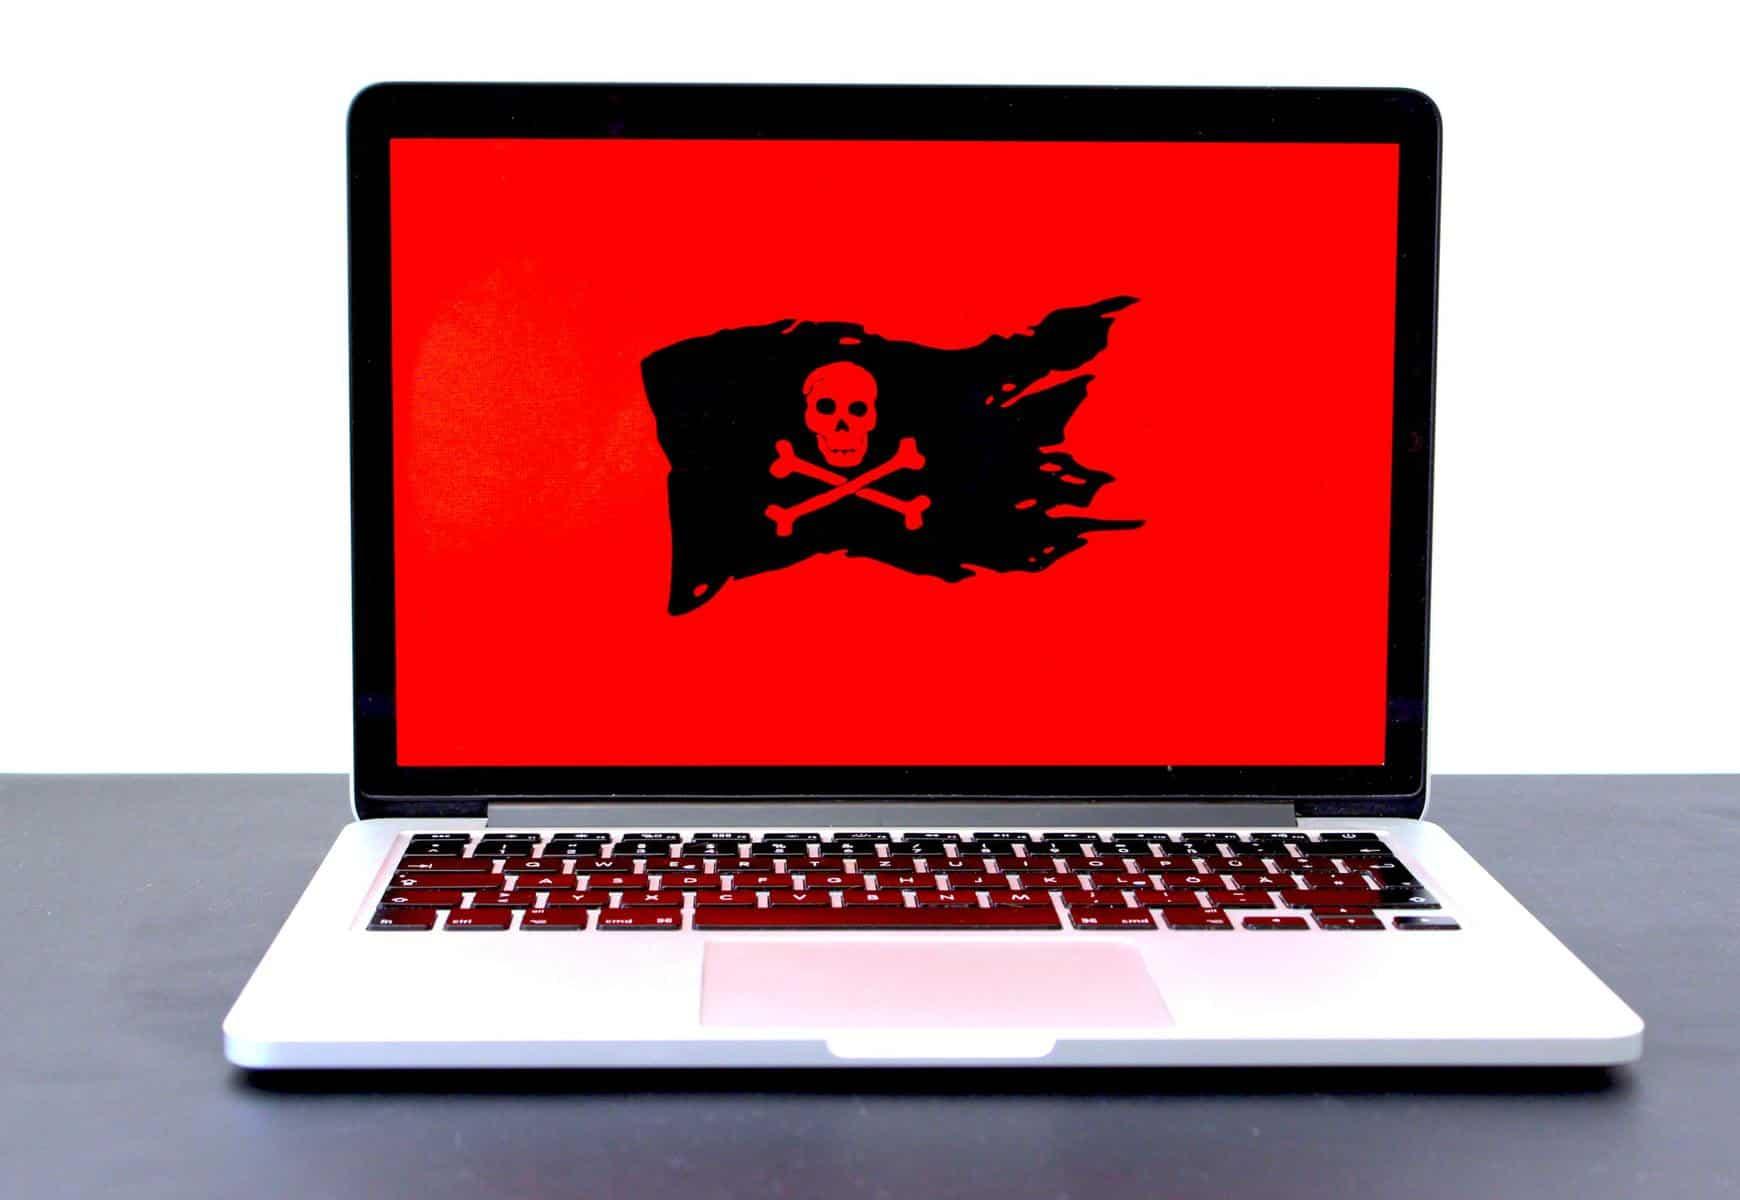 Laptop showing hacked screen